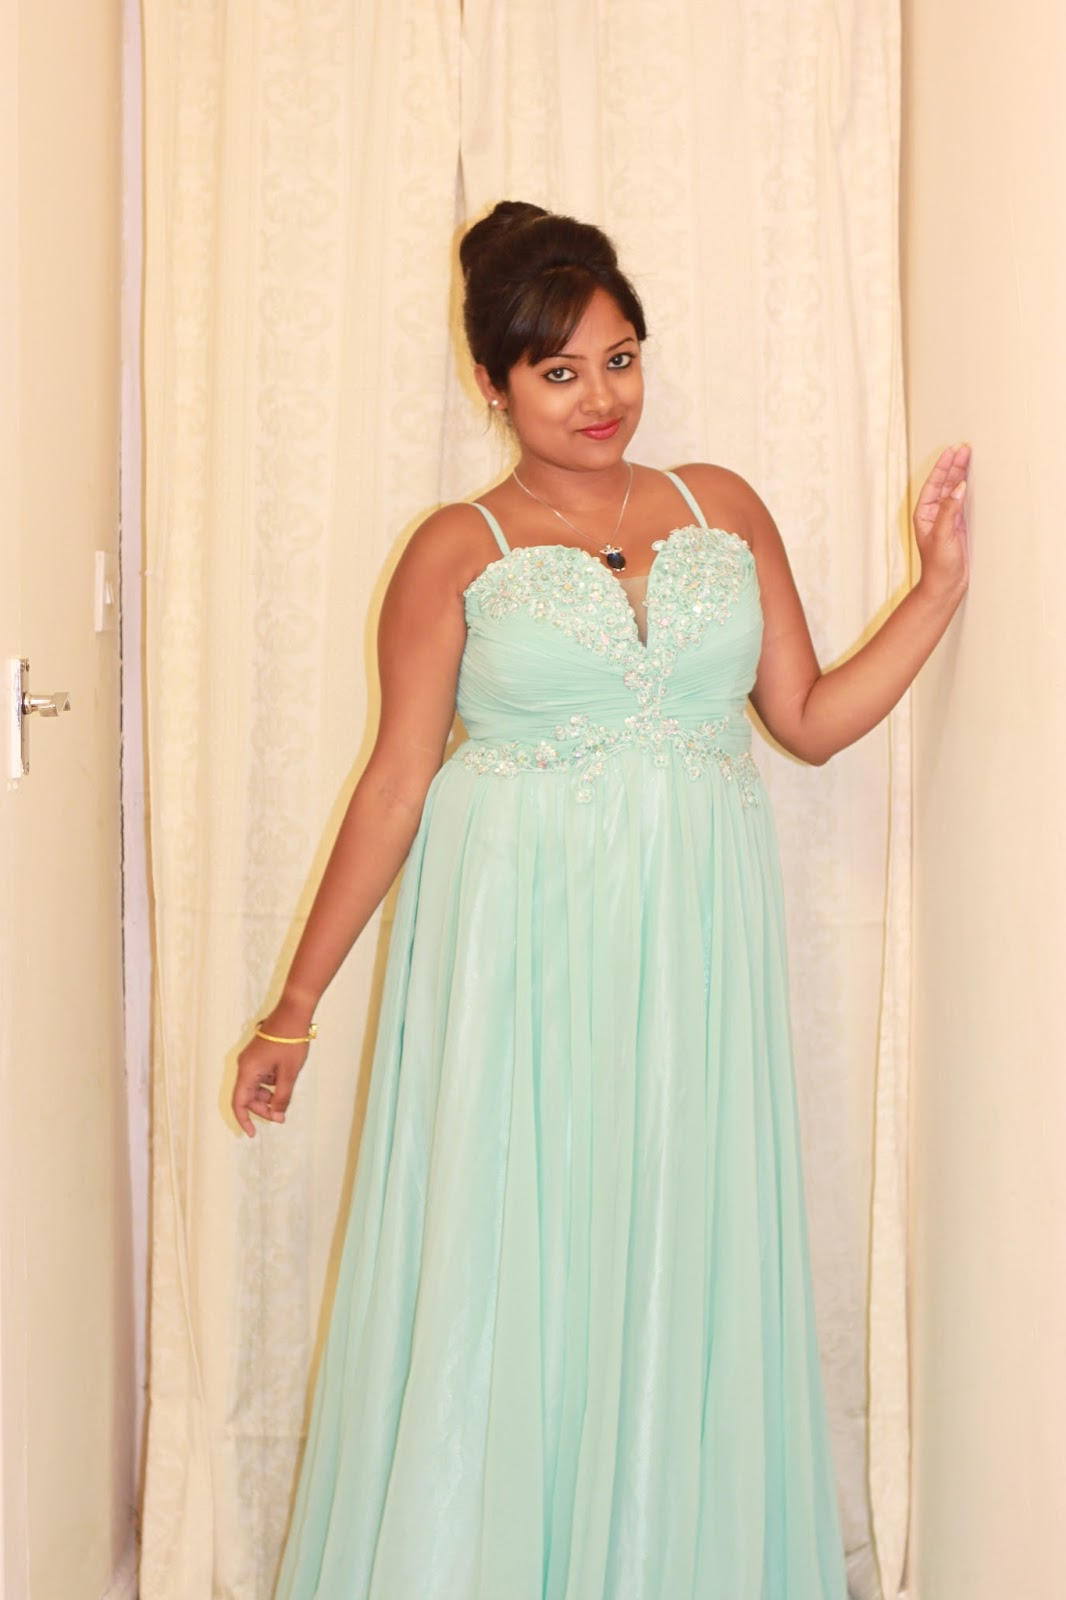 long dresses on indian girl, long dresses, maxi dresses, beautiful girl in a long dress